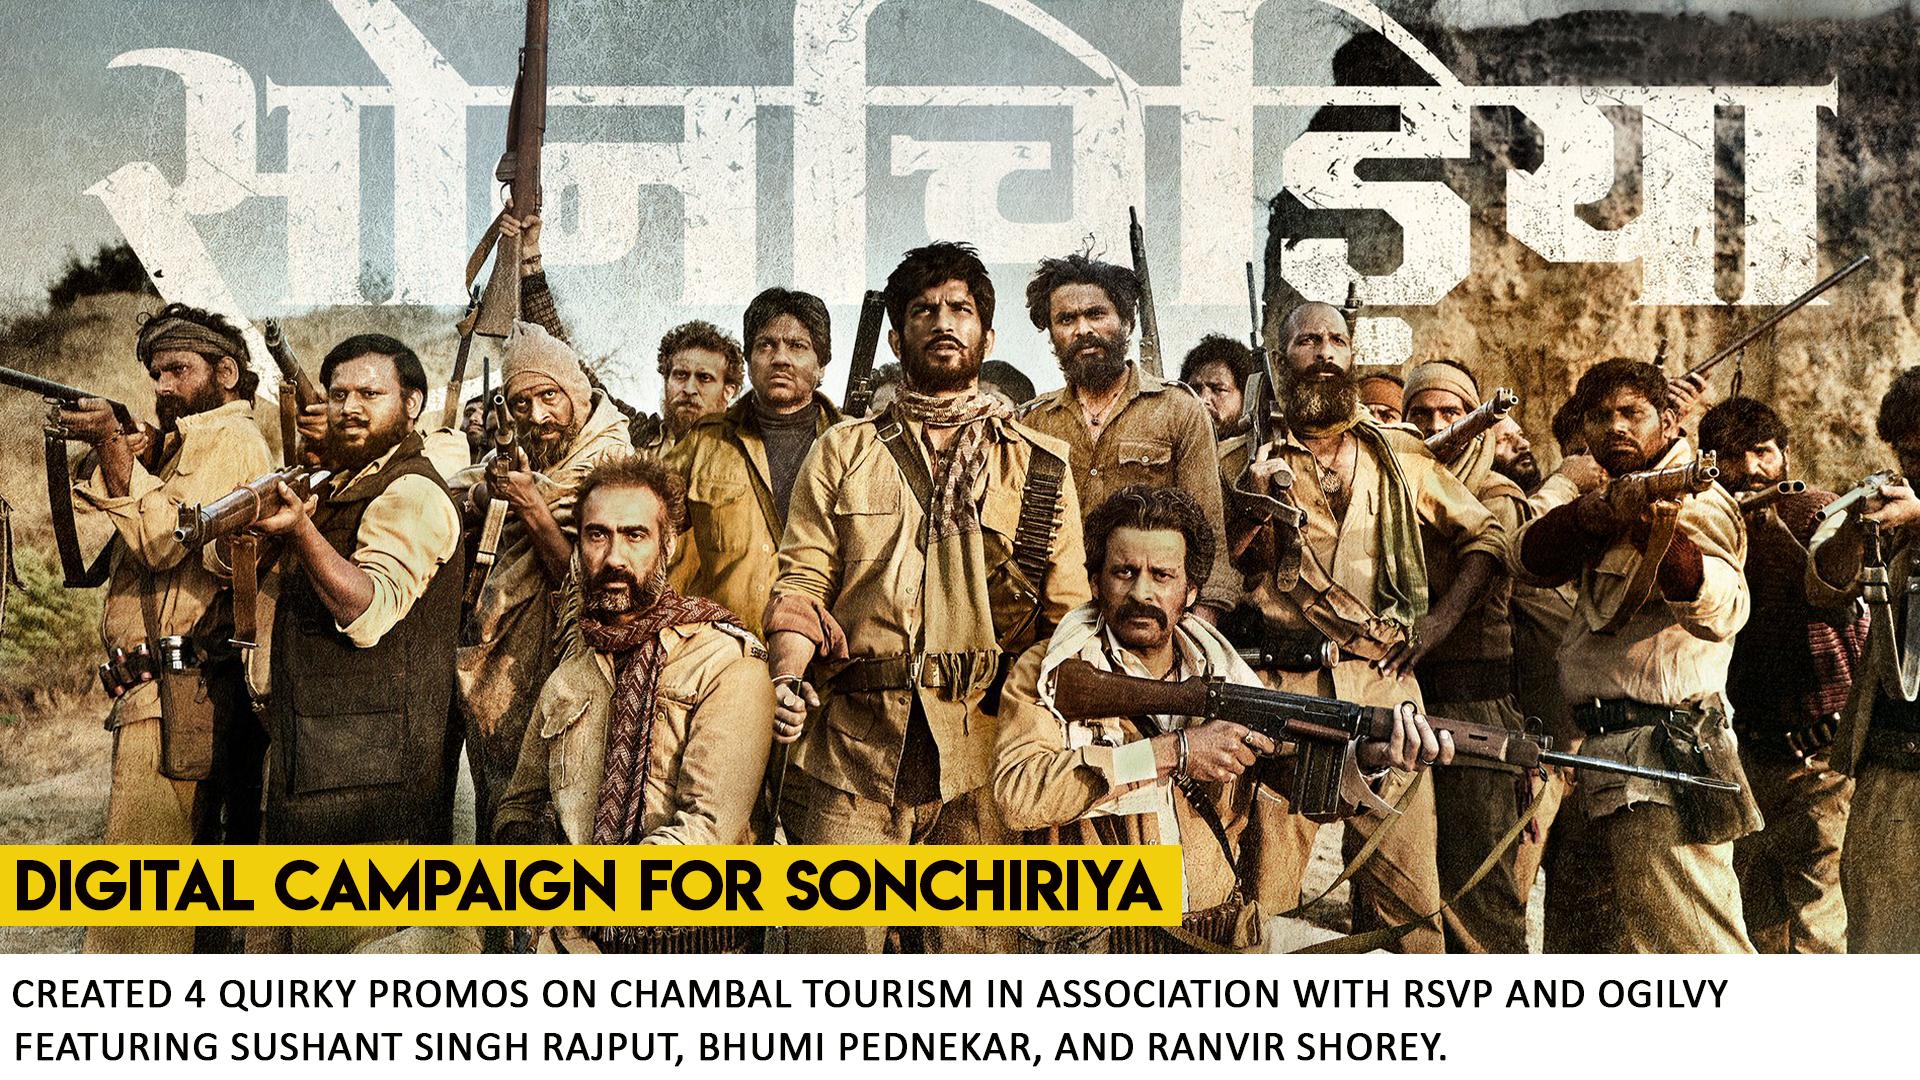 Sonchiriya Campaign by What Works